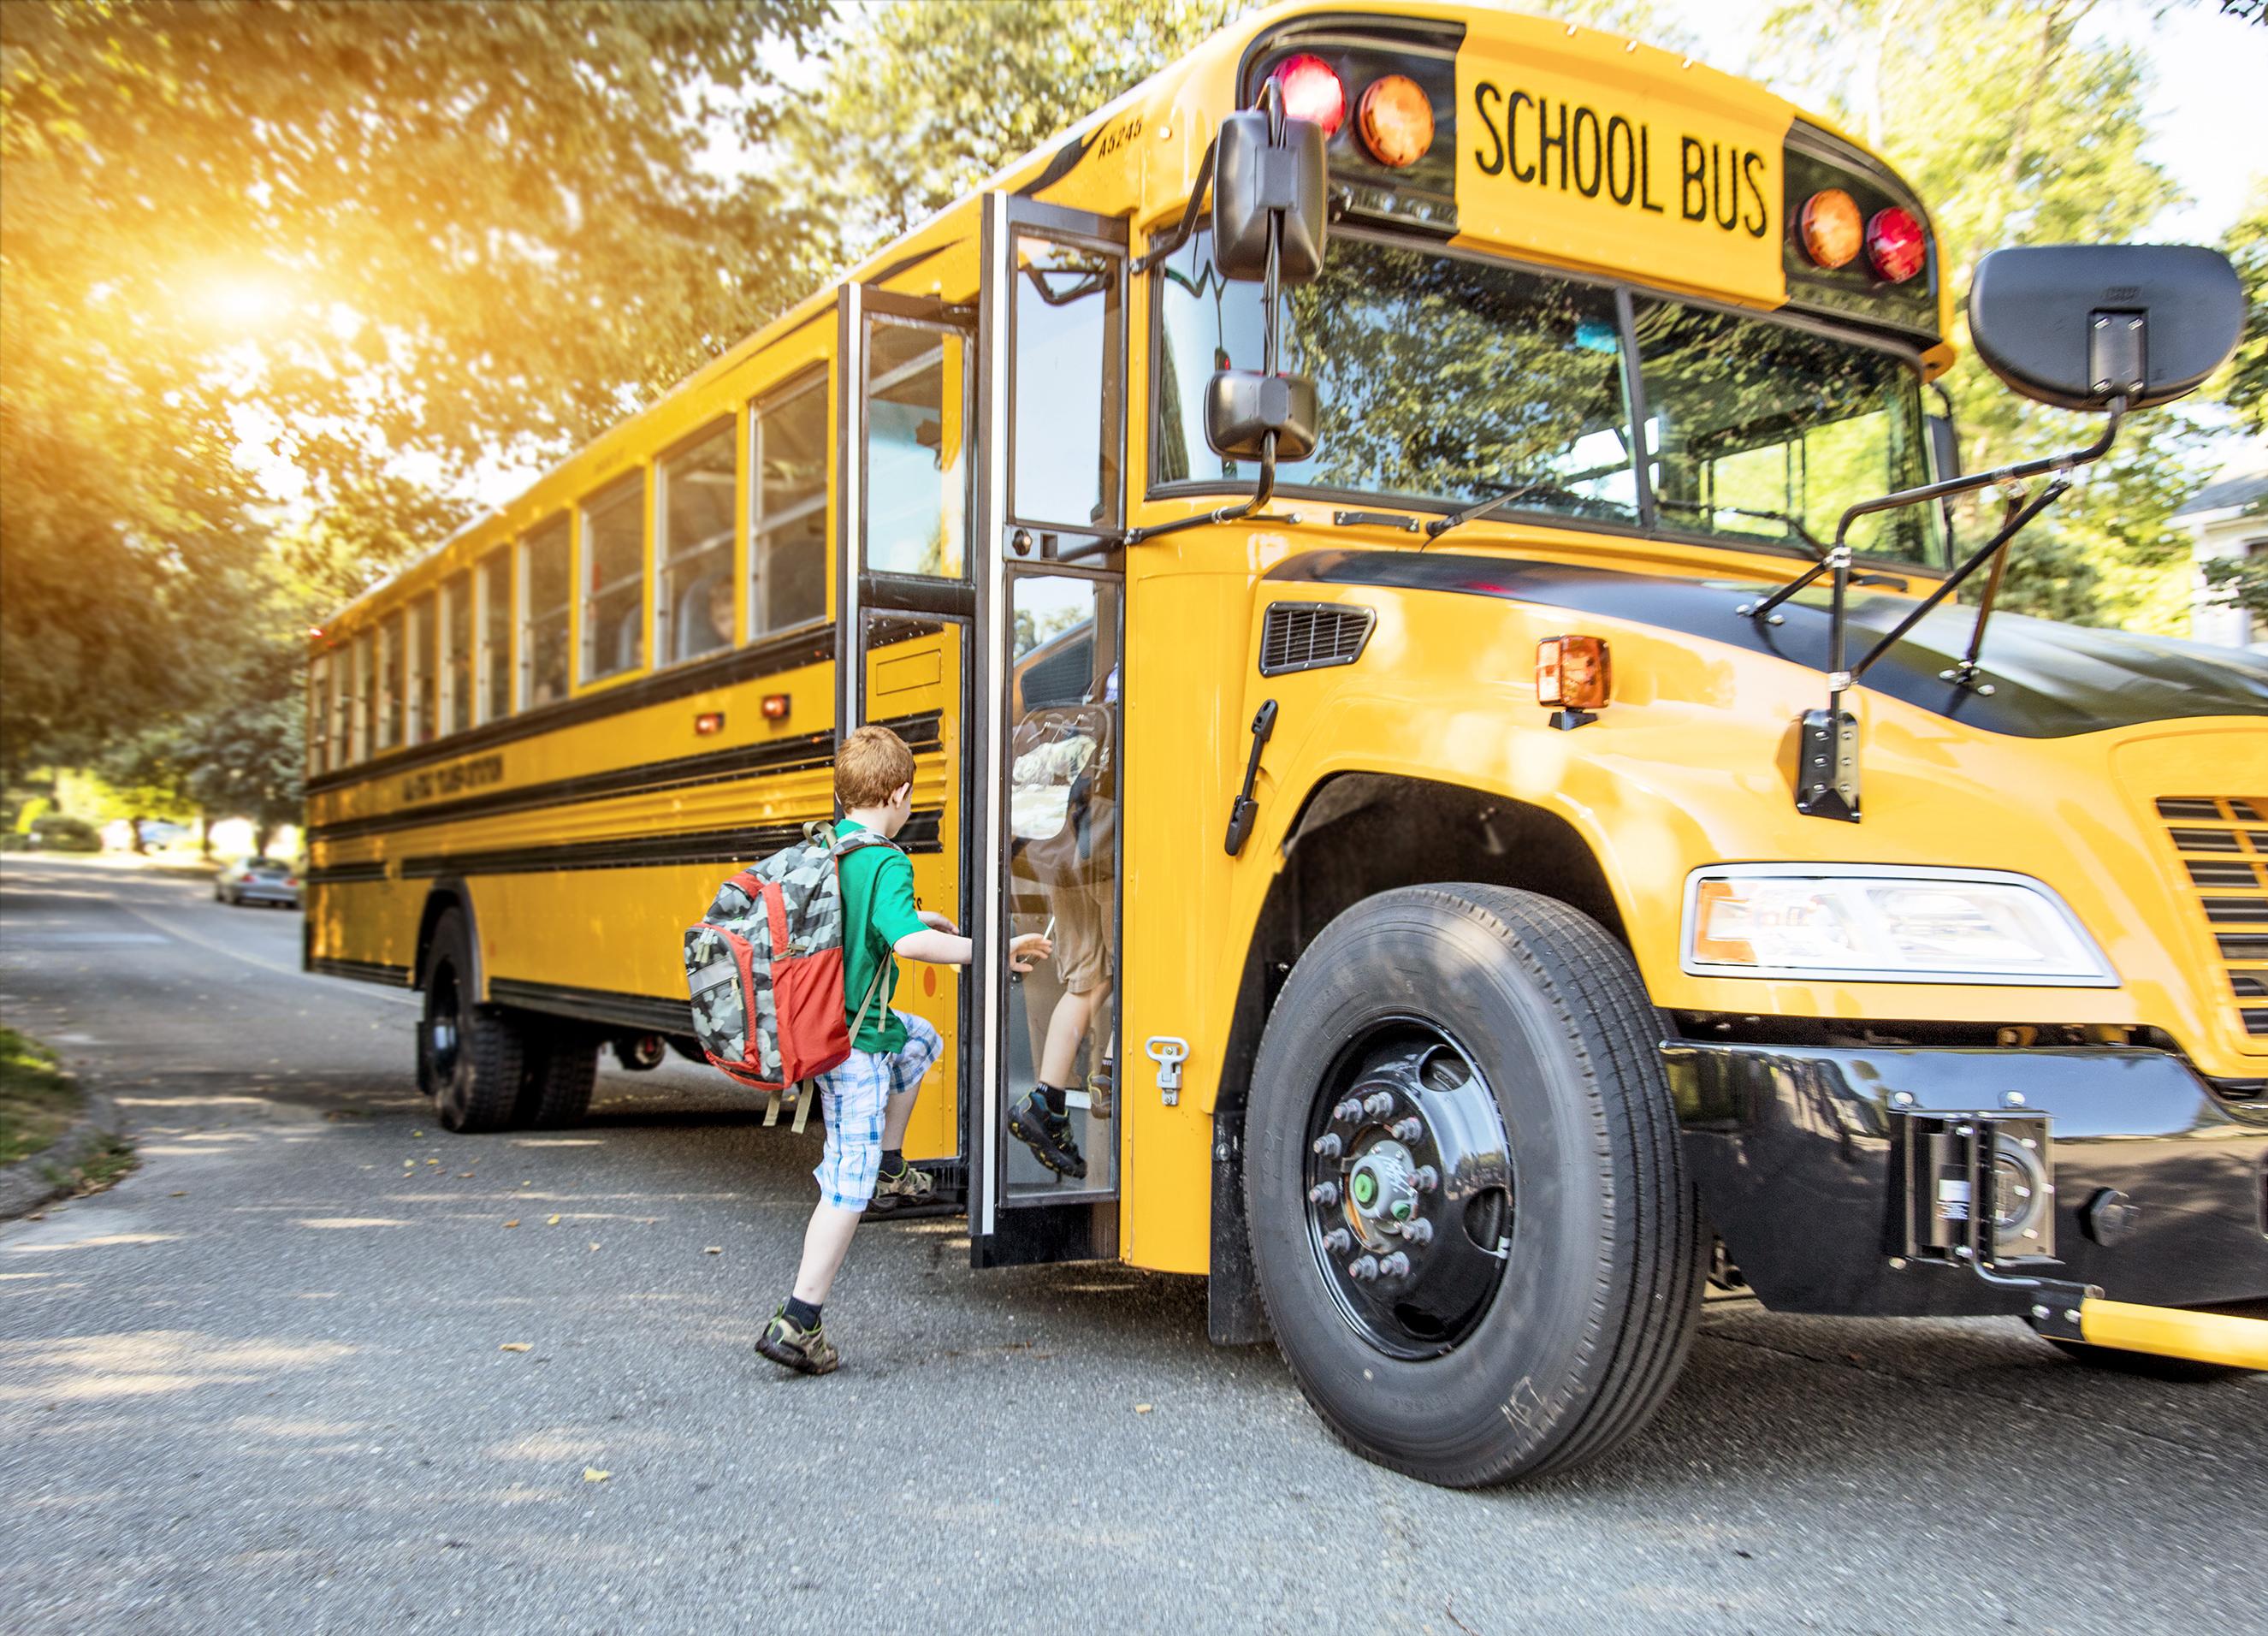 School Bus. Shutterstock